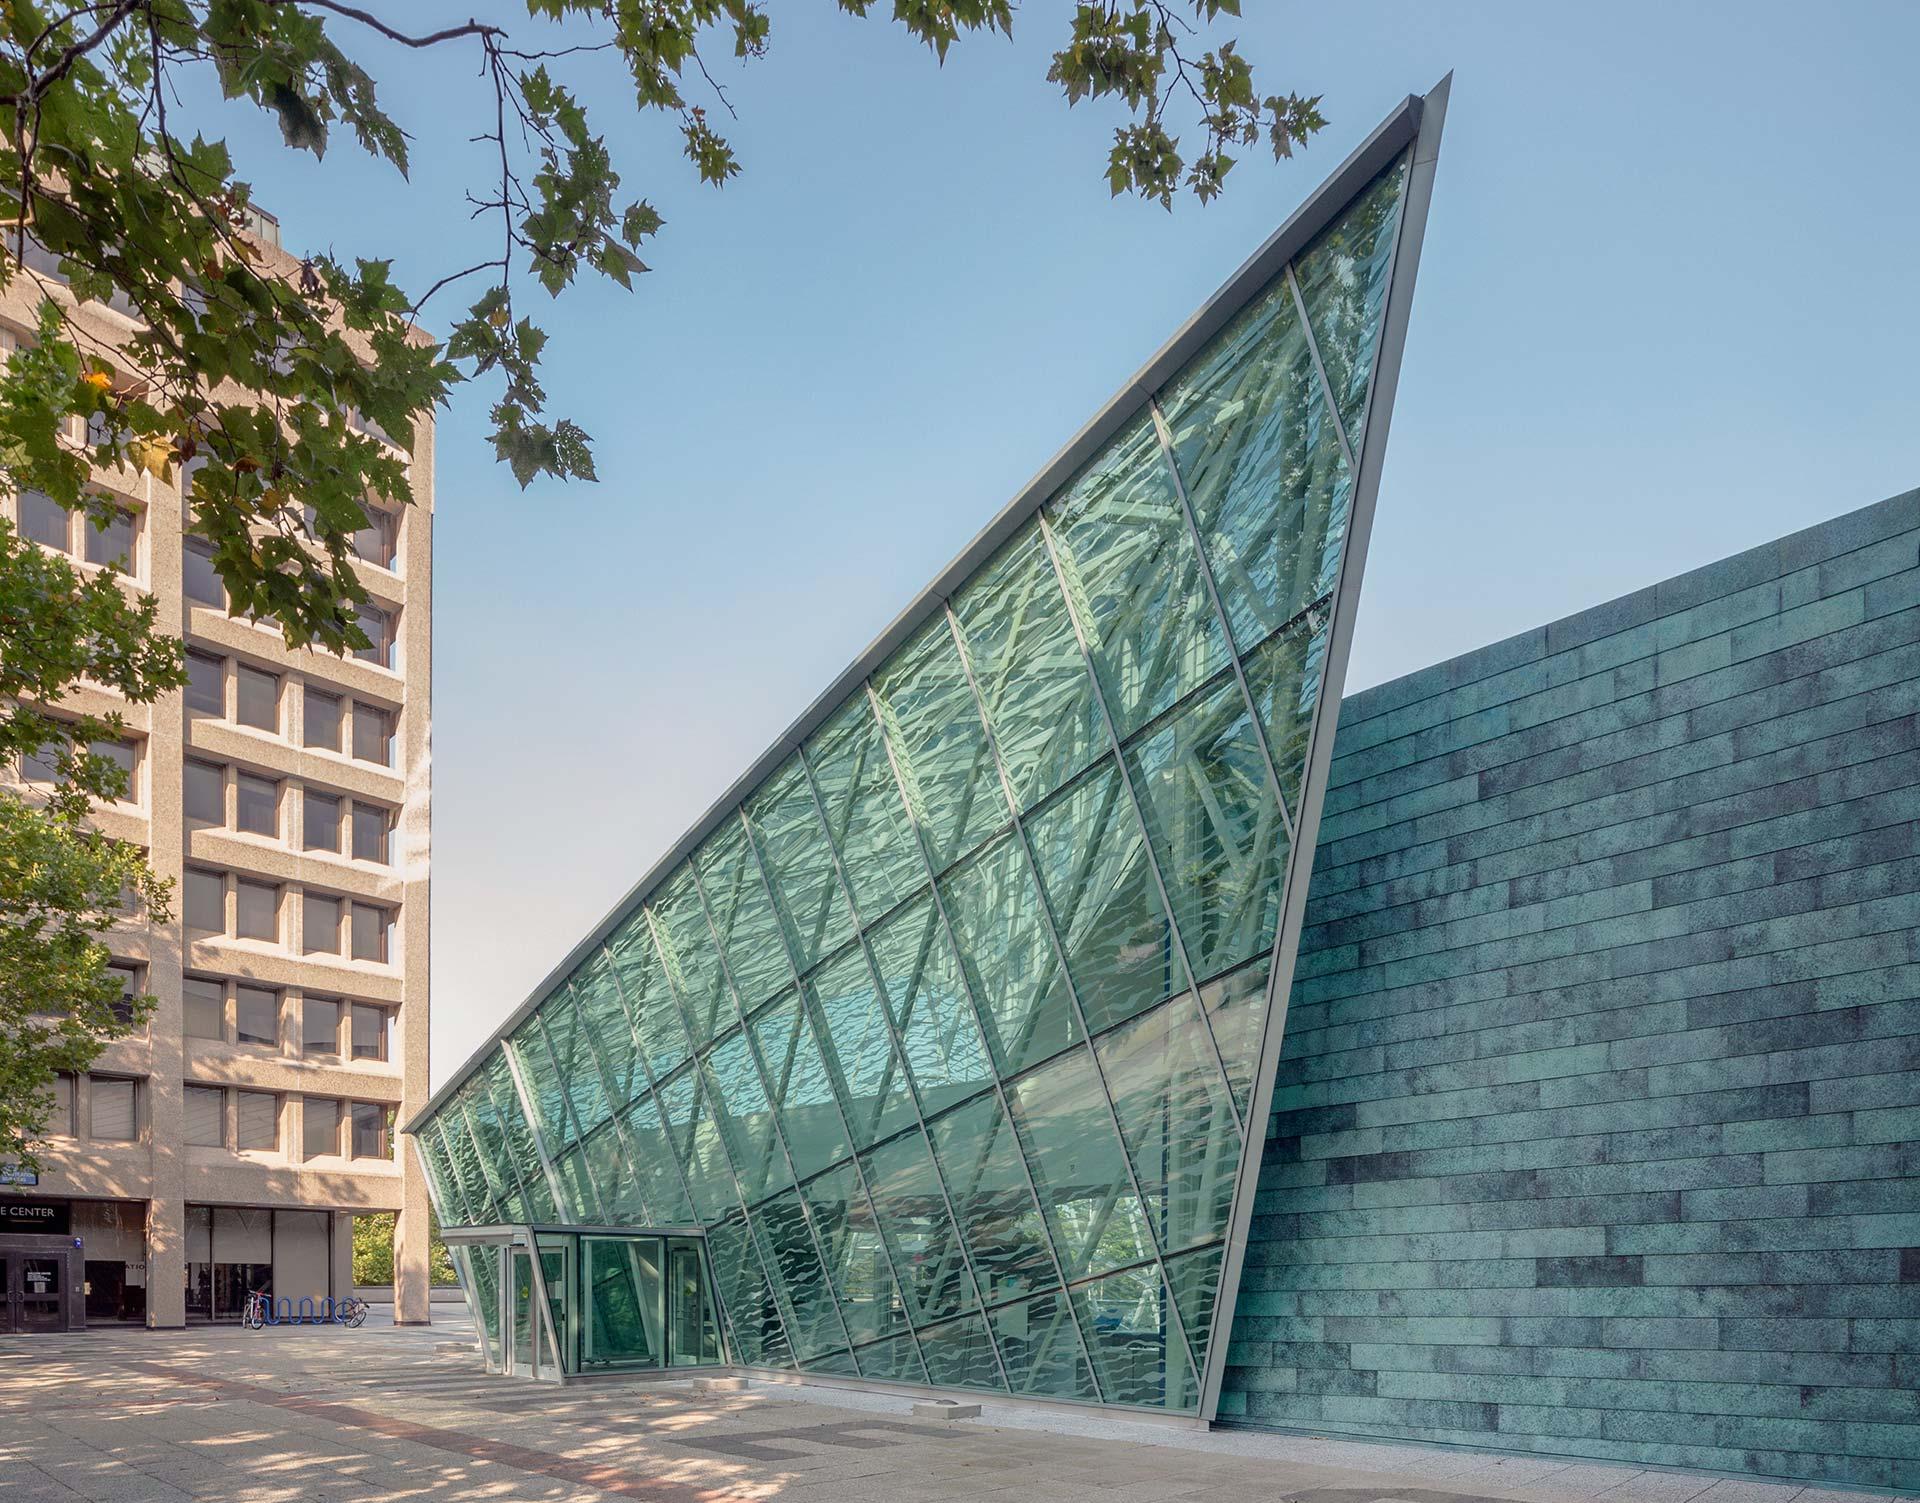 The ikon.5 architects-designed SUNY New Paltz Student Union Building